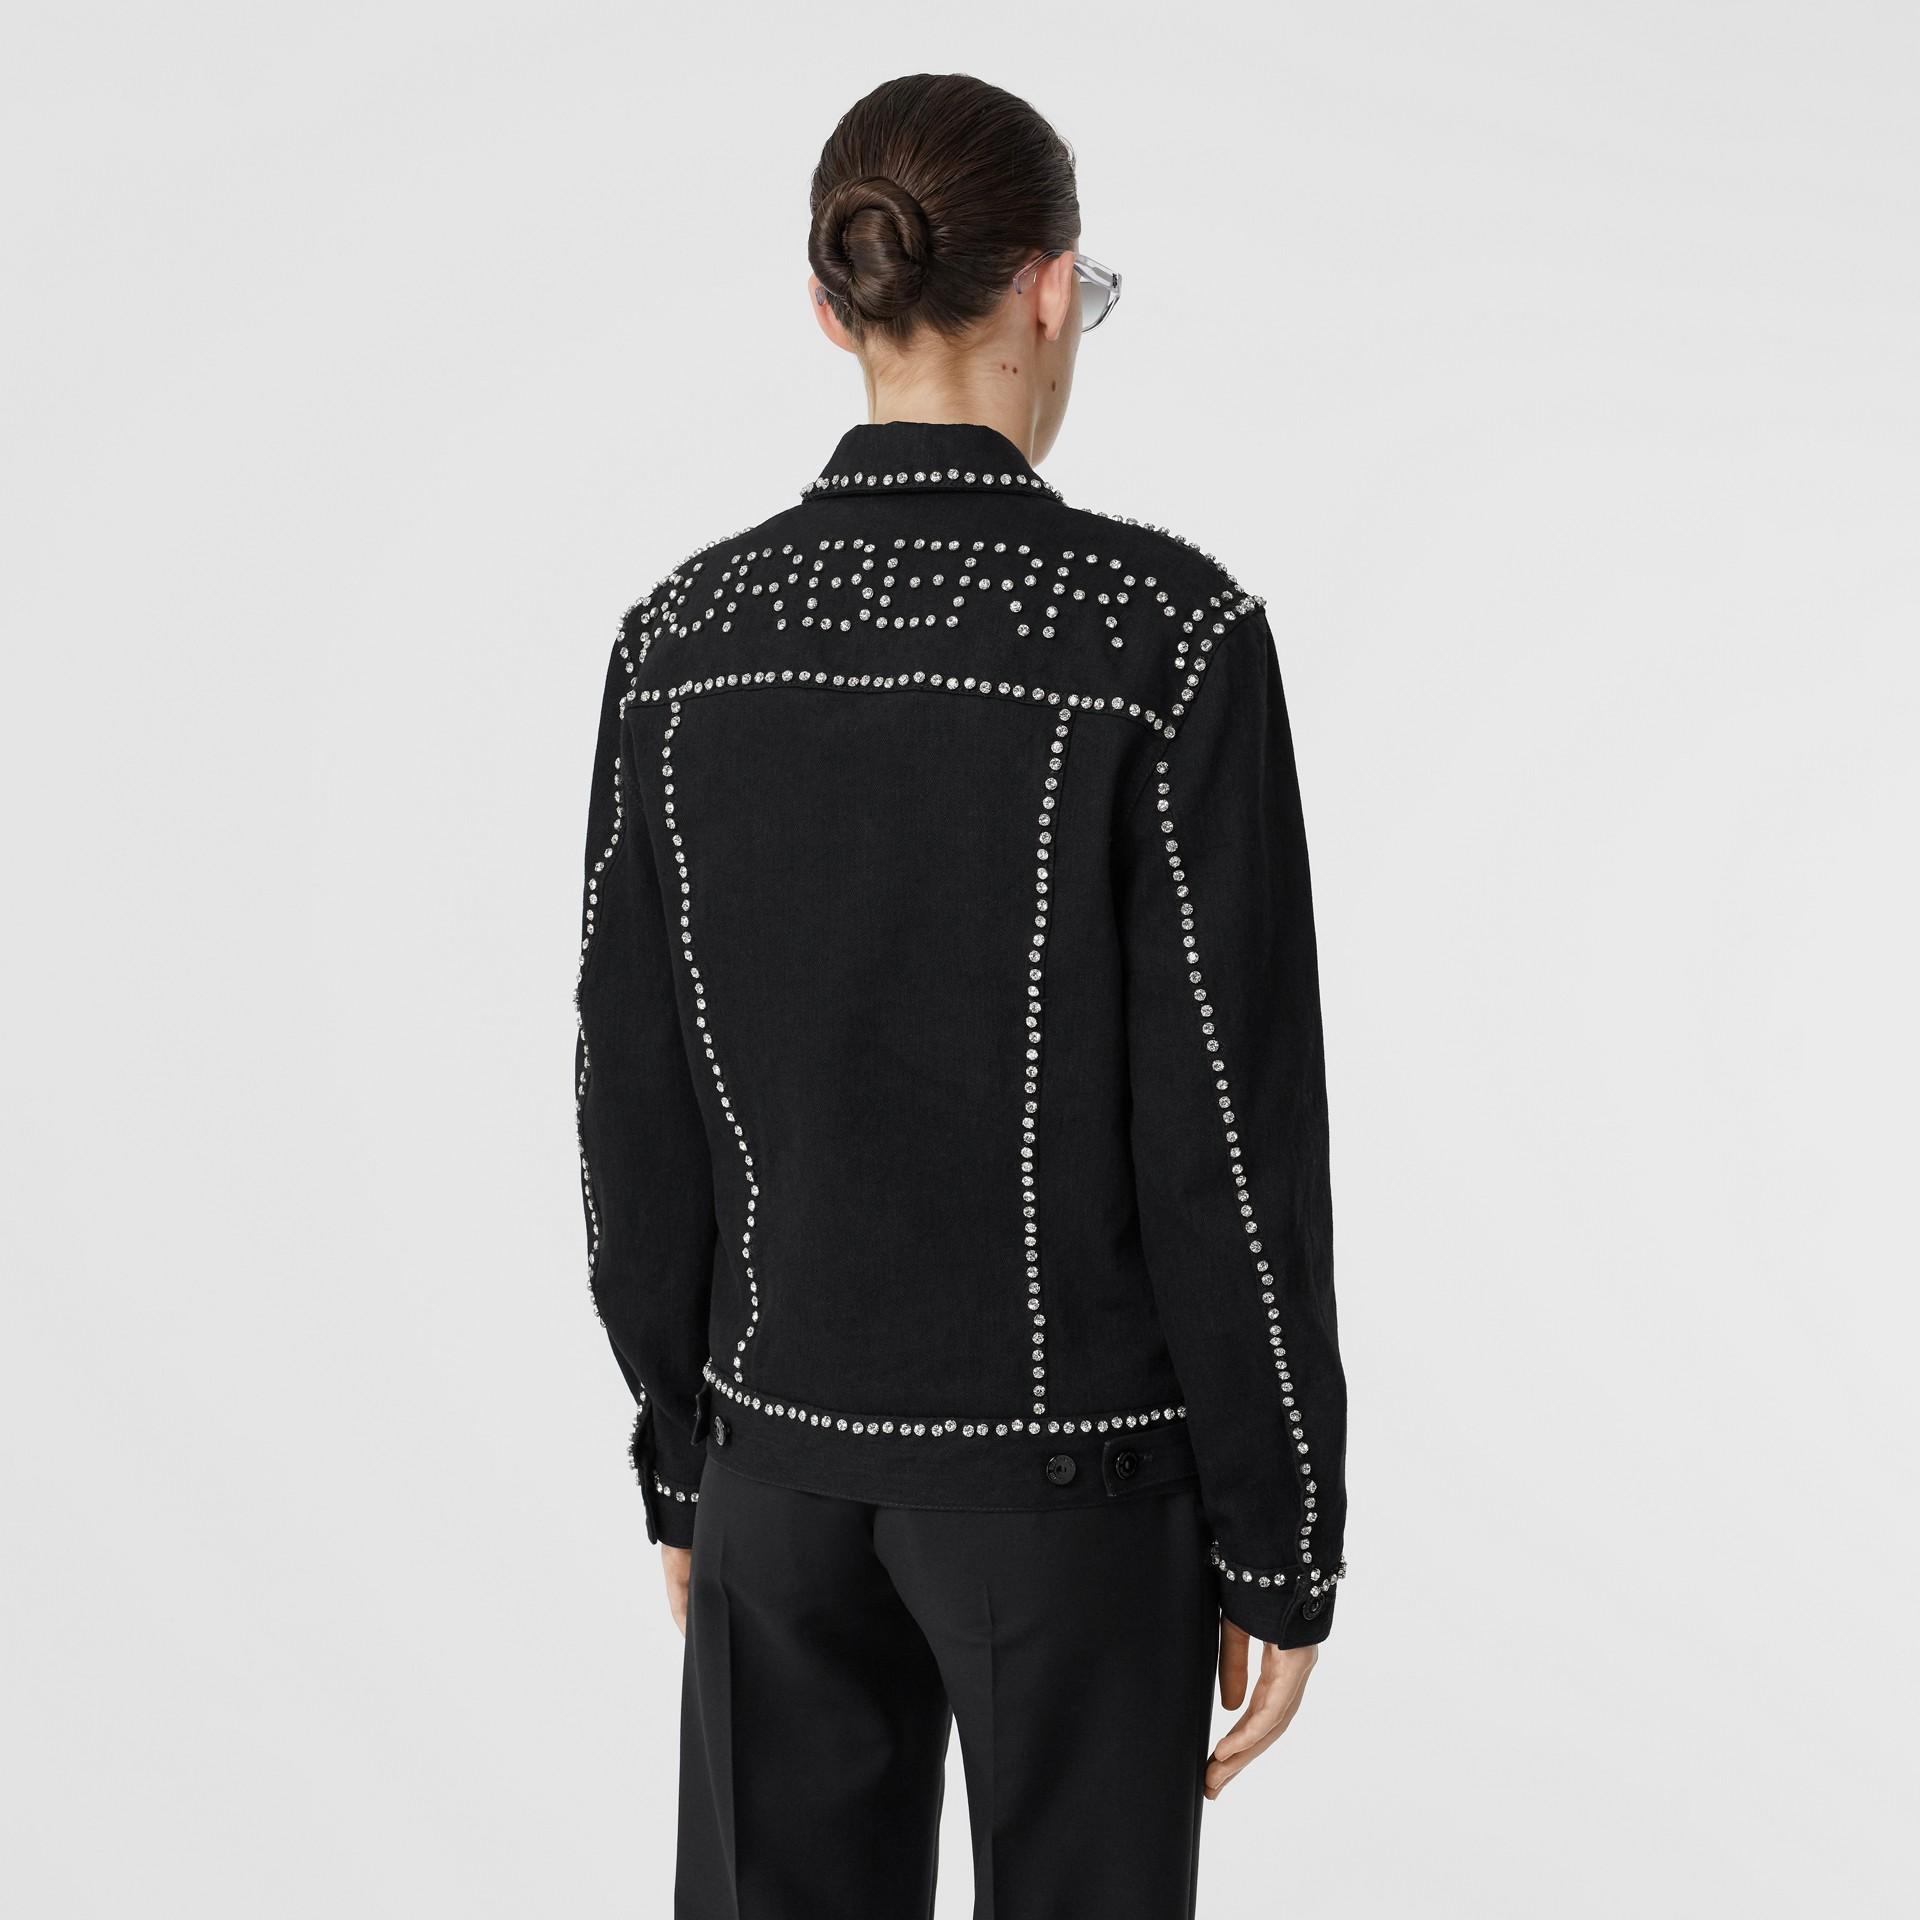 Crystal Logo Detail Japanese Denim Jacket in Black - Women | Burberry United Kingdom - gallery image 2